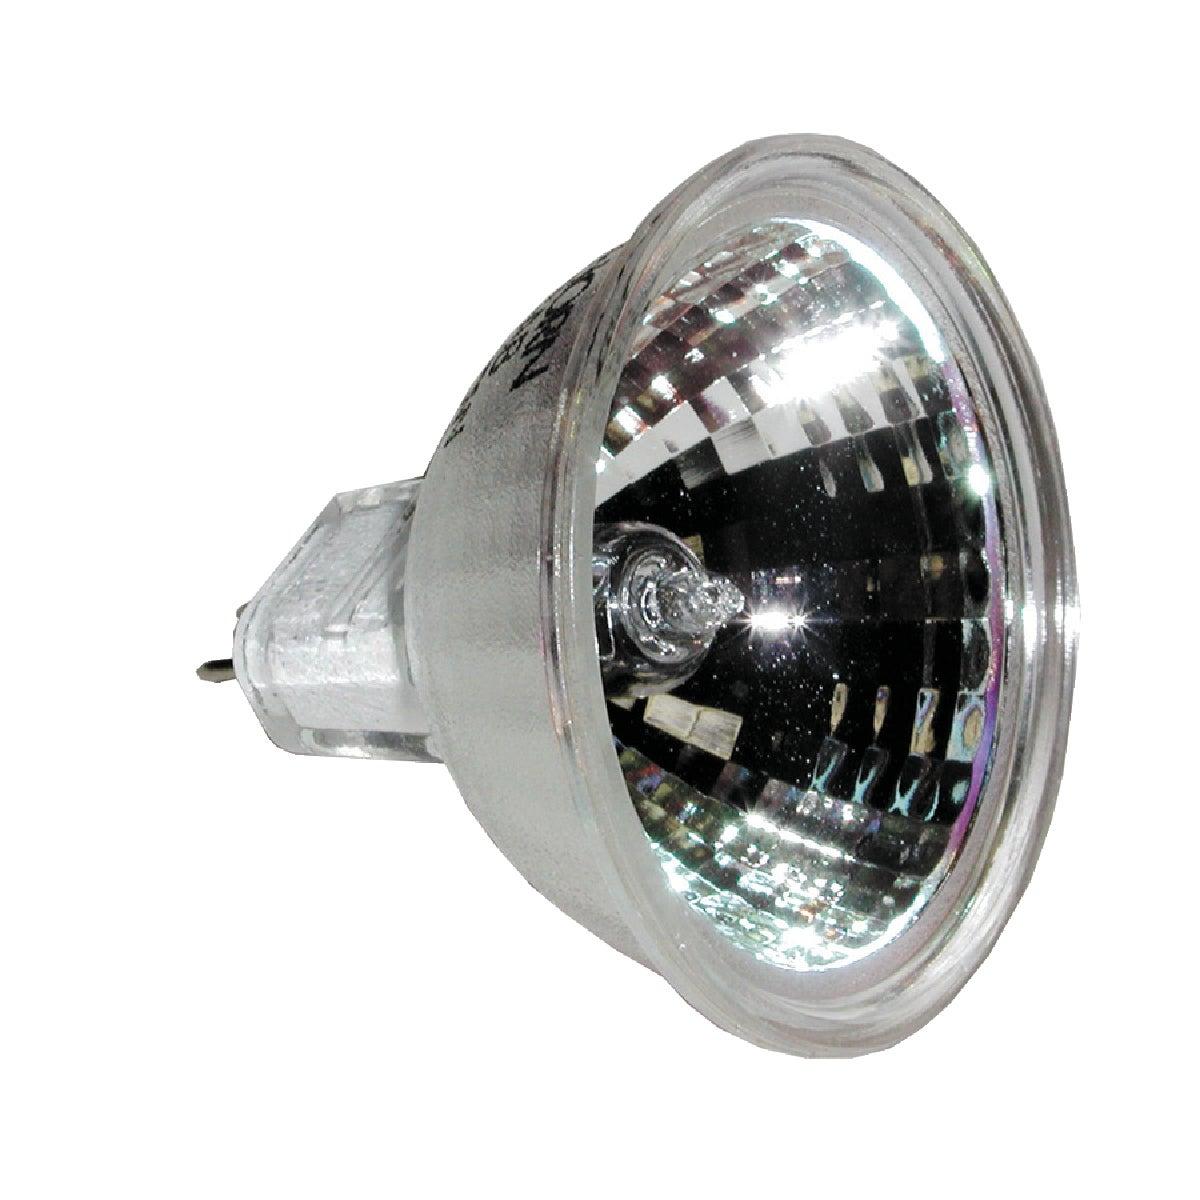 Moonrays 35W Equivalent Clear GU5.3 Base MR16 Halogen Spotlight Light Bulb